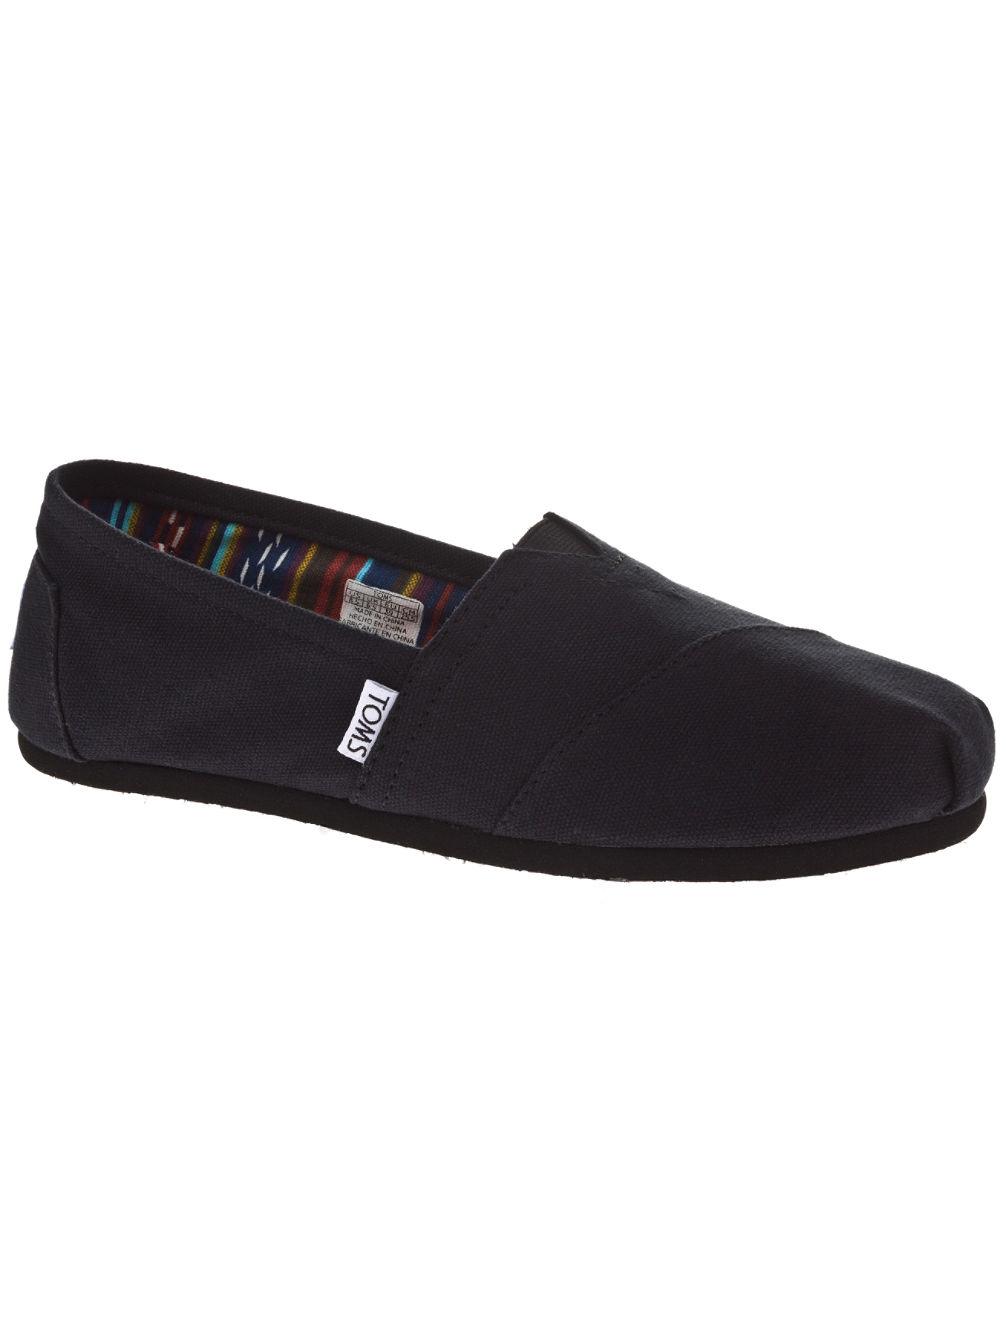 toms-core-classics-slippers-women